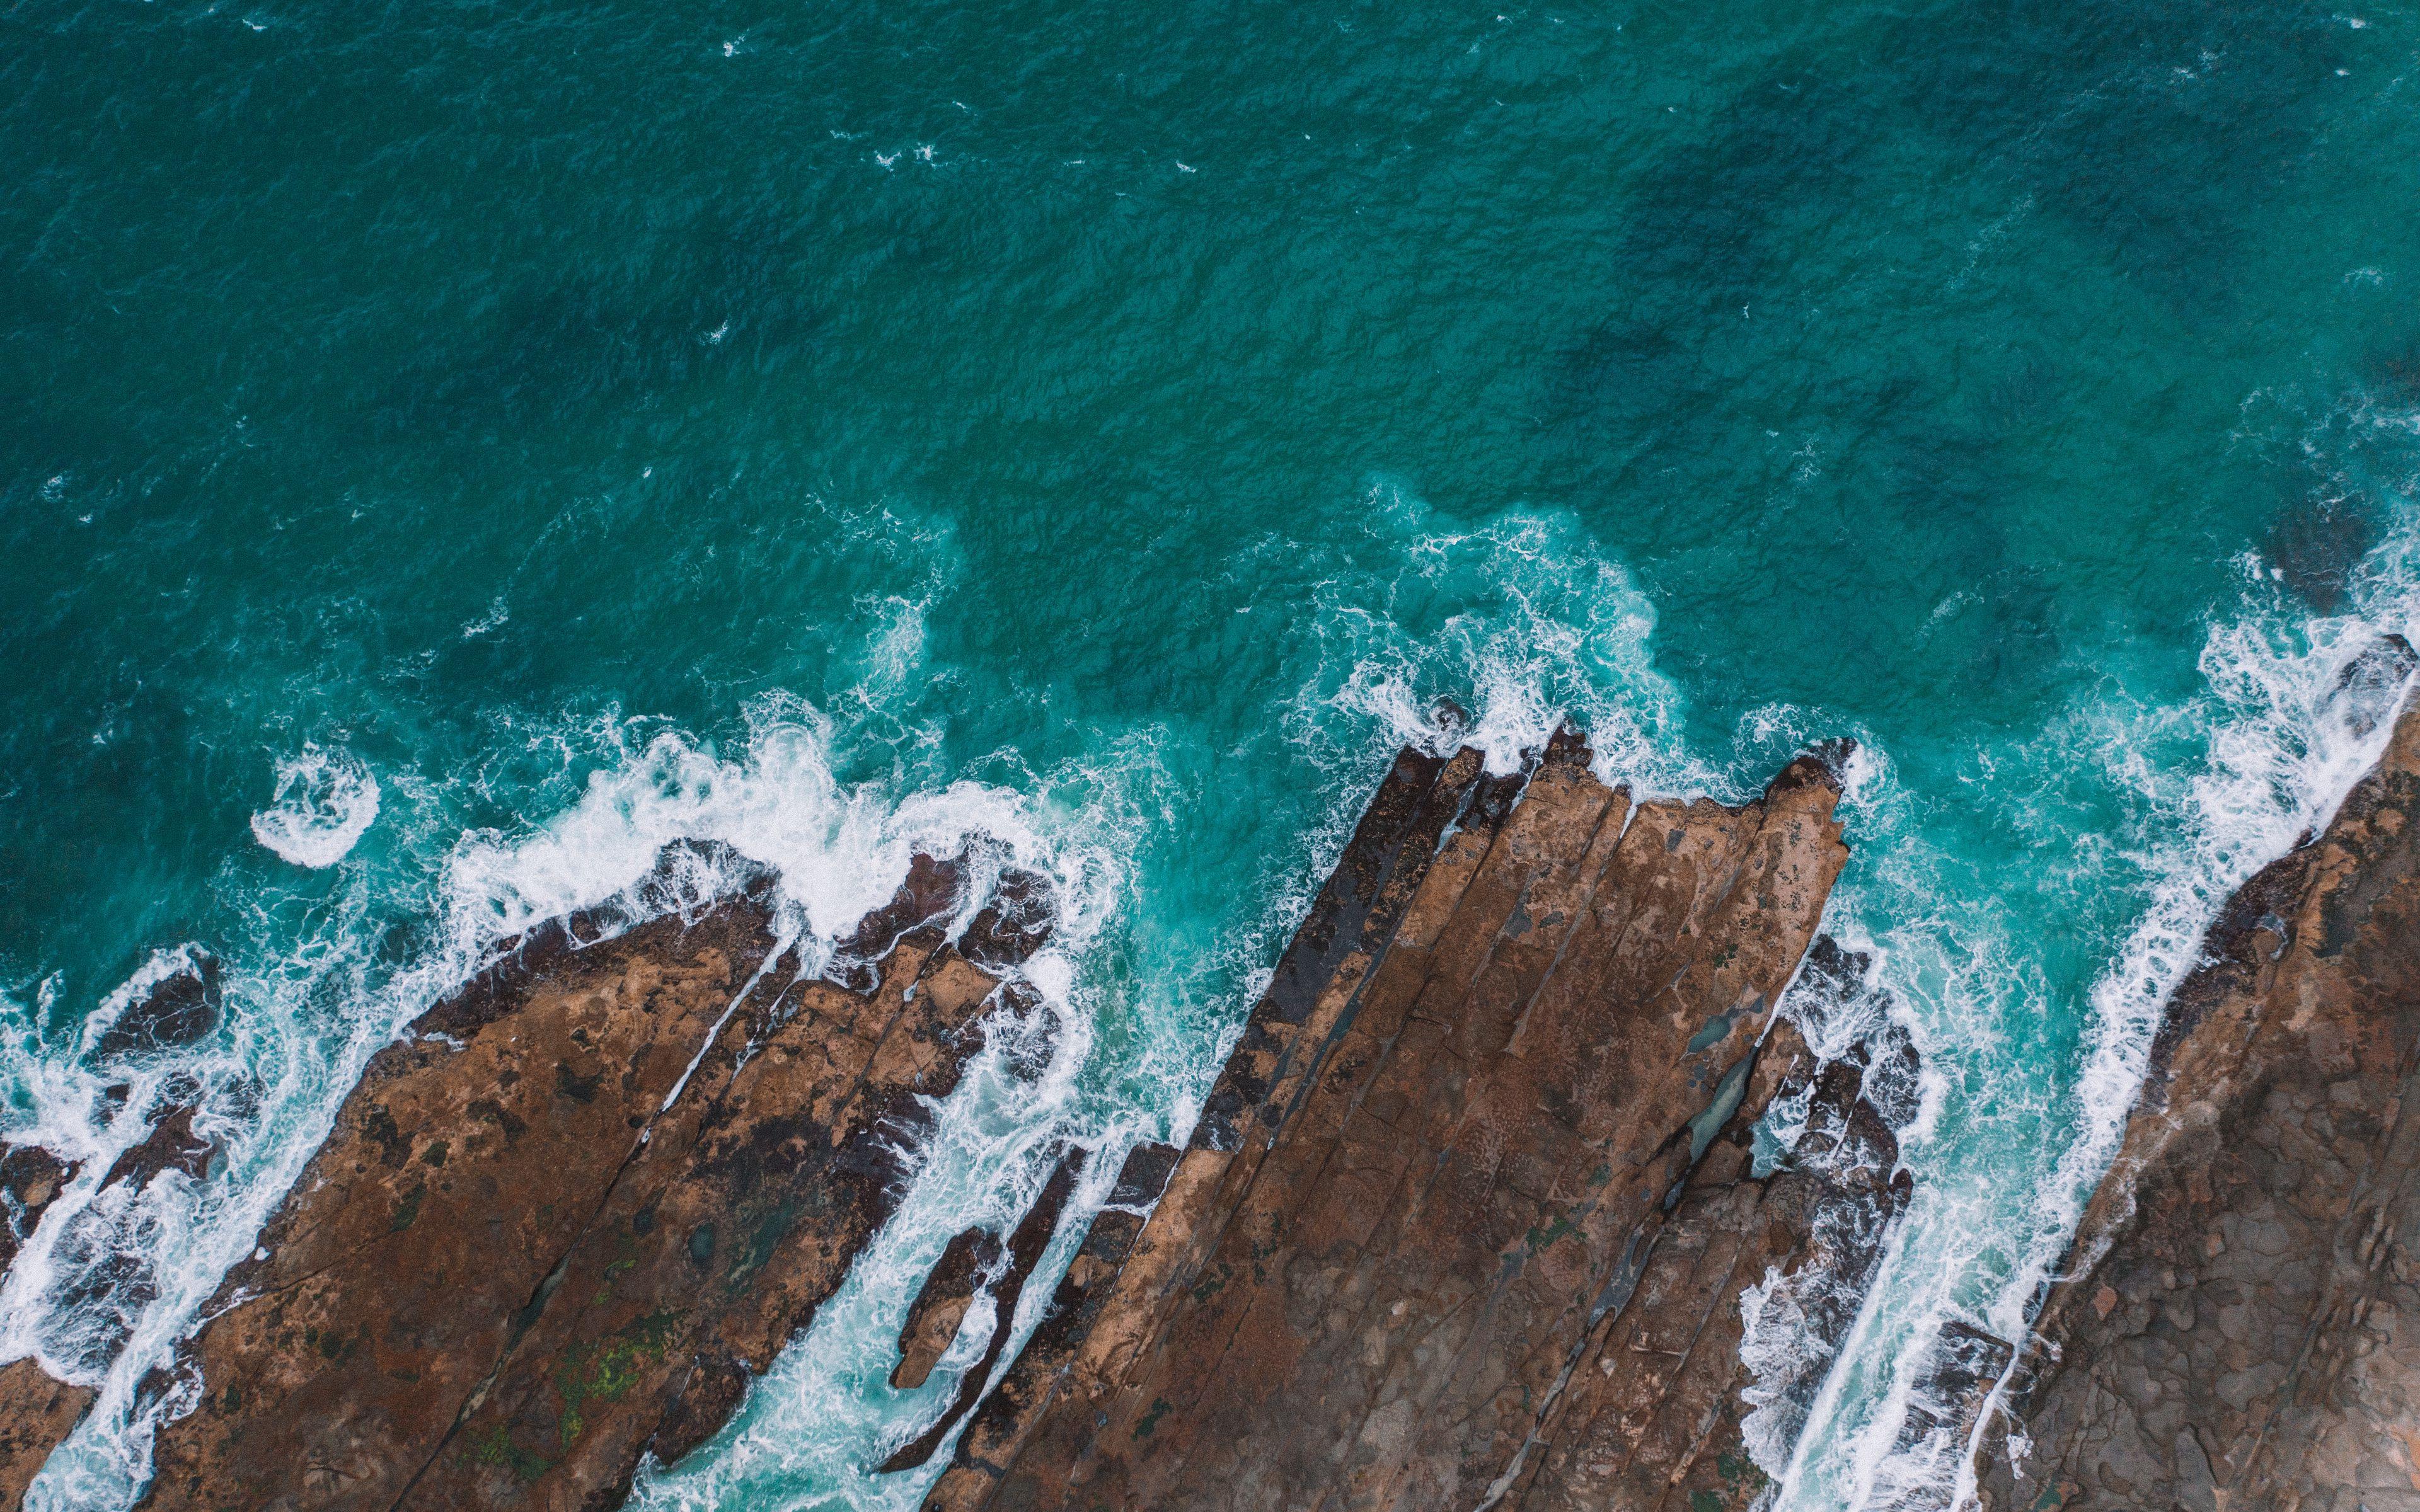 Download wallpaper 3840x2400 sea rocks aerial view coast water 3840x2400